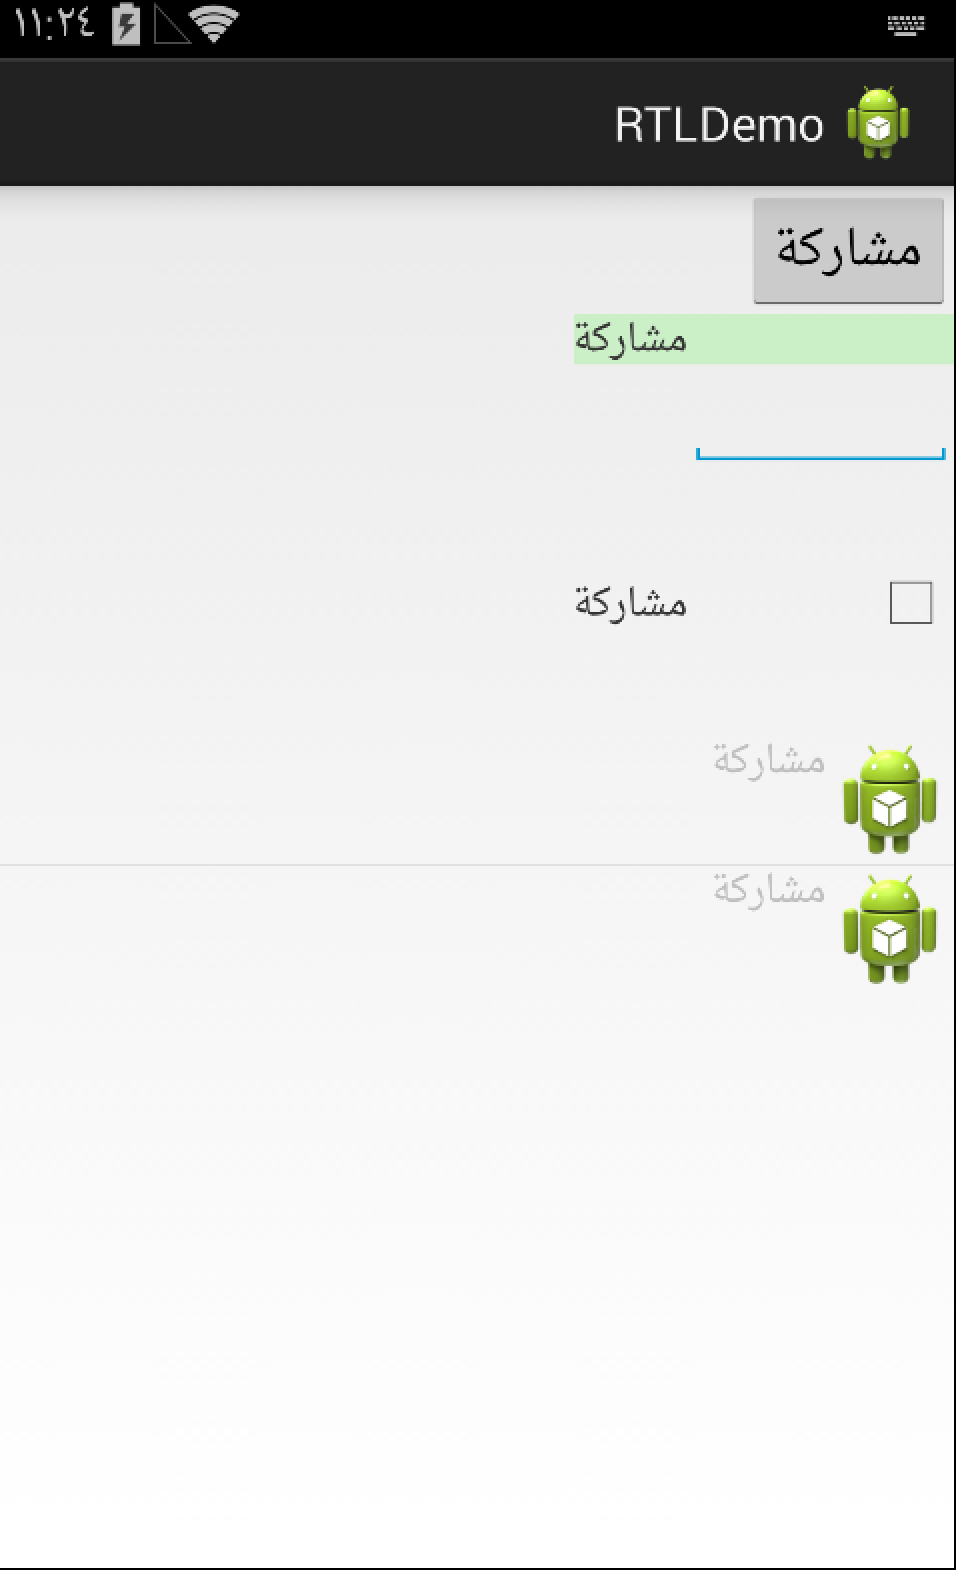 Rtl suport Arabic